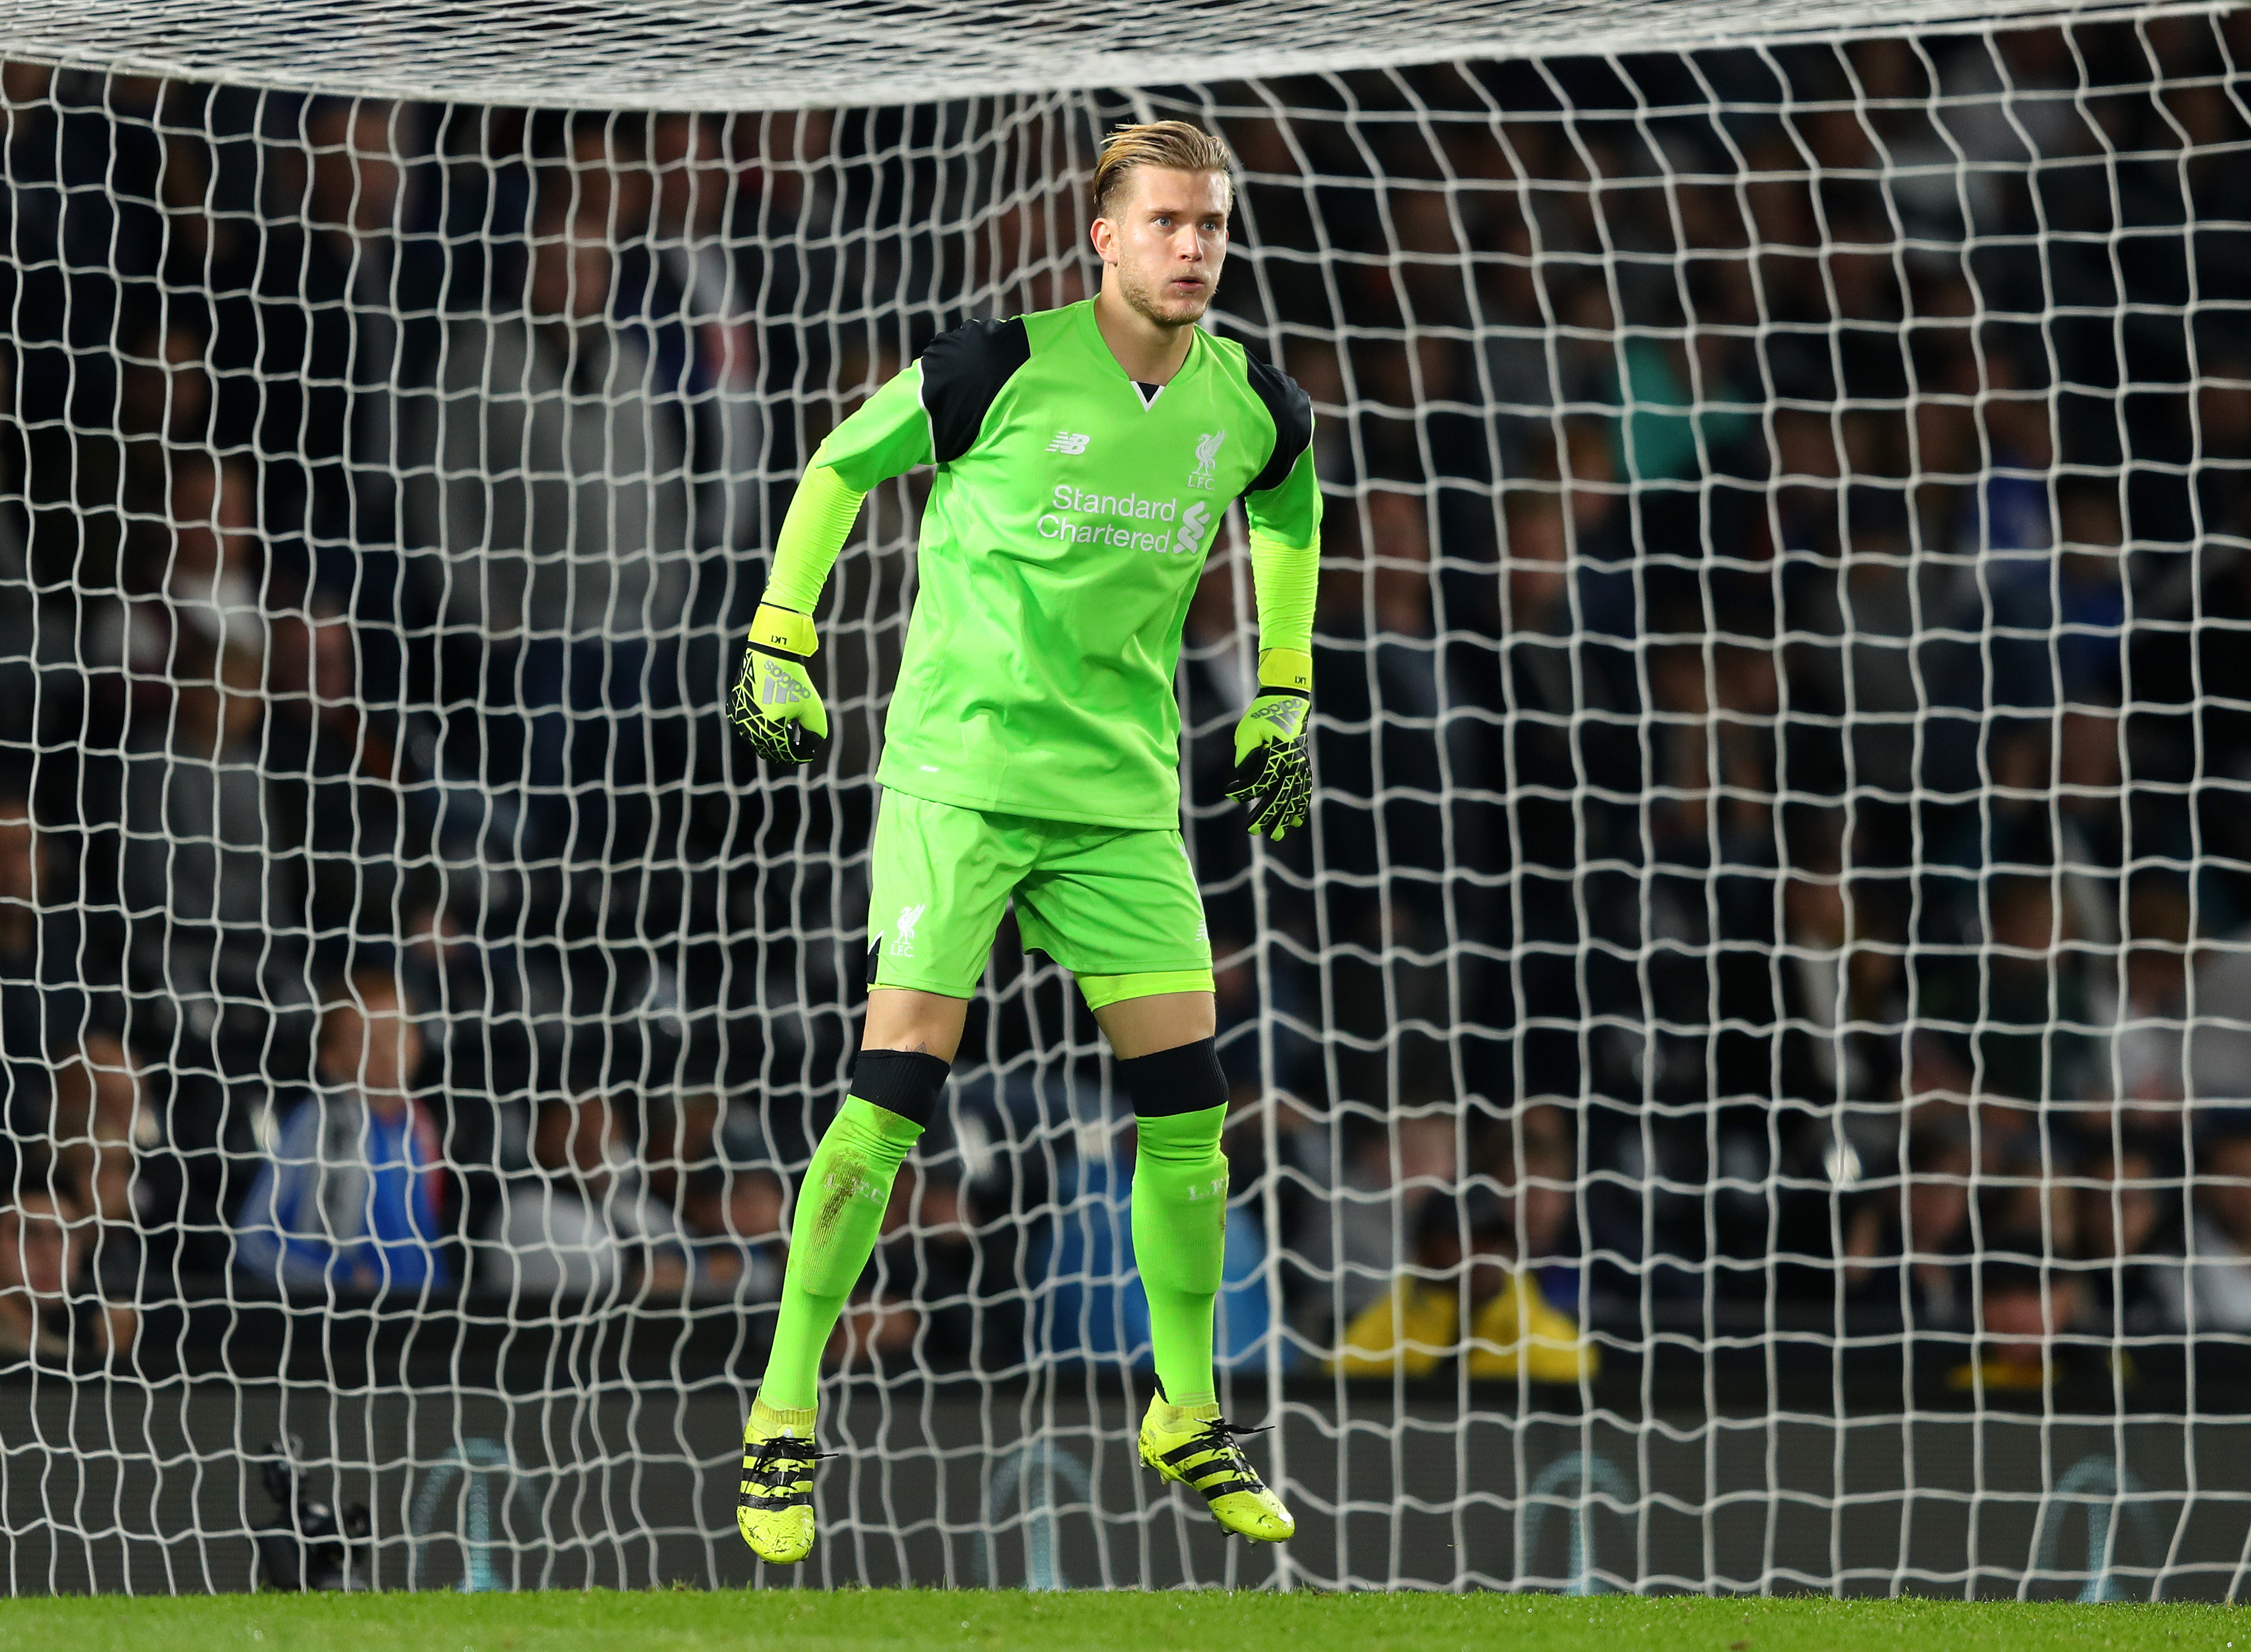 Jurgen Klopp confirms FIVE days in advance that Loris Karius will start over Simon Mignolet for Liverpool